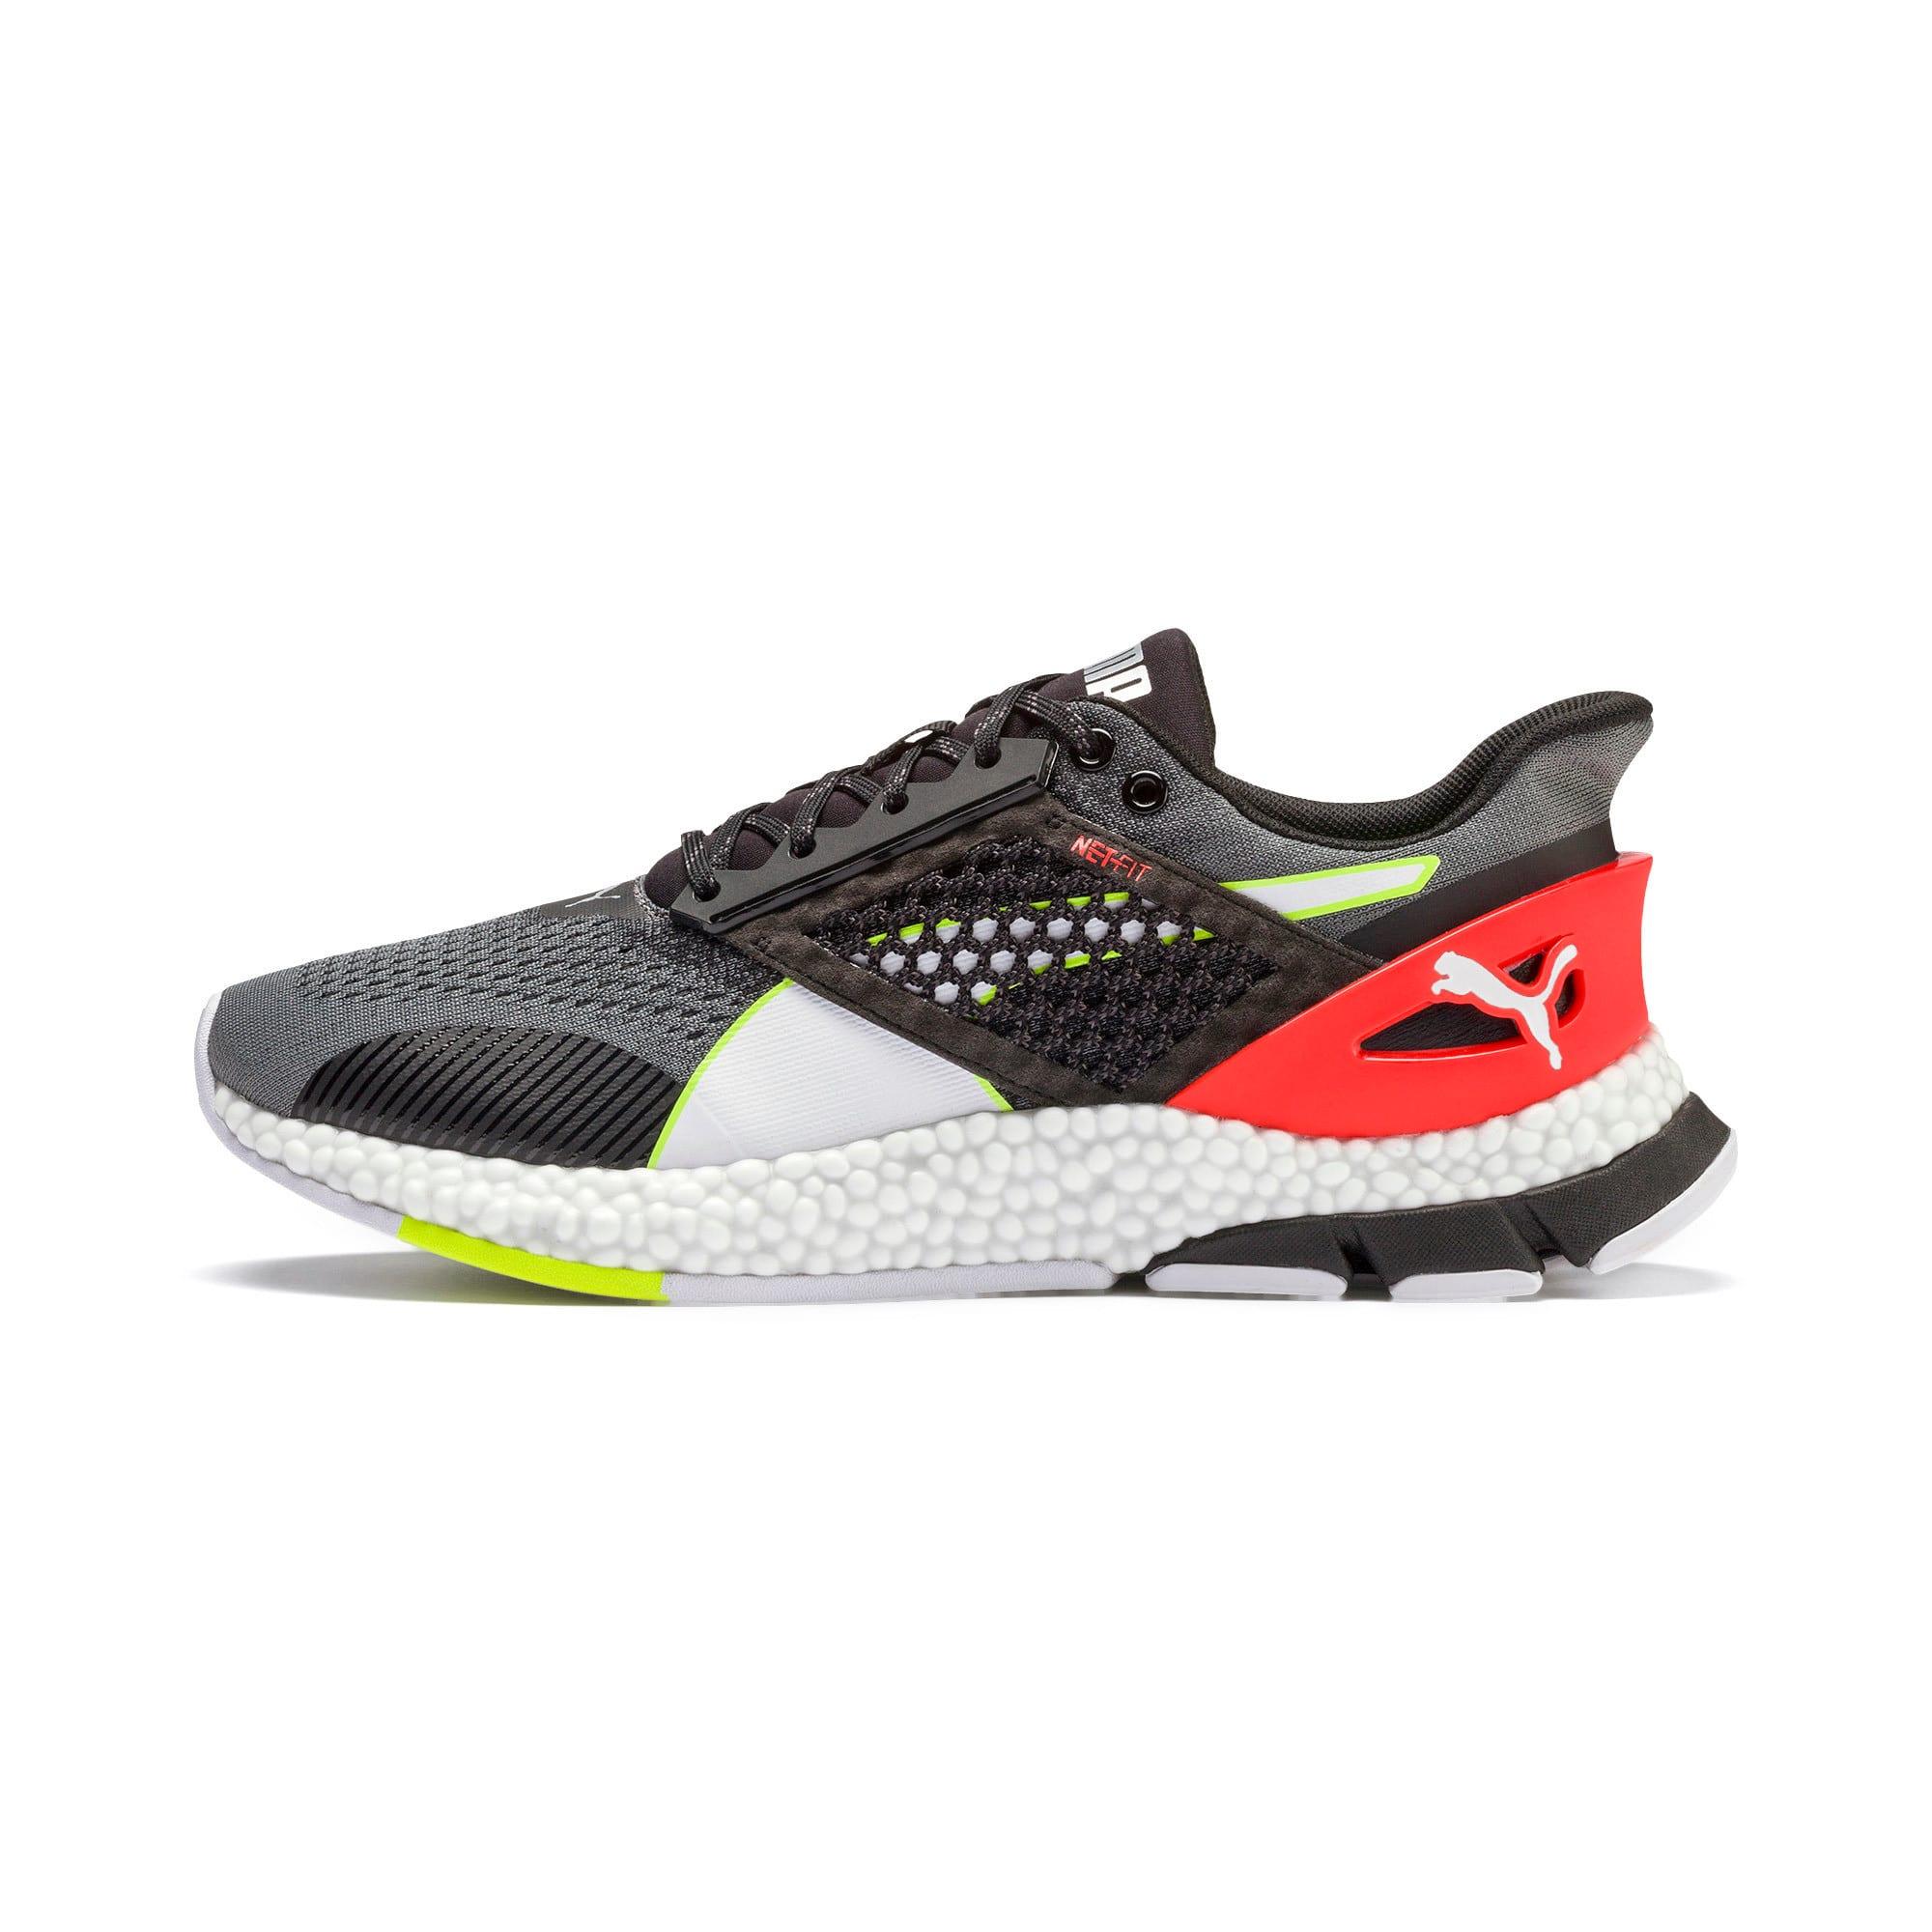 Thumbnail 1 of HYBRID Astro Men's Running Shoes, CASTLEROCK-Puma Blck-Ngy Red, medium